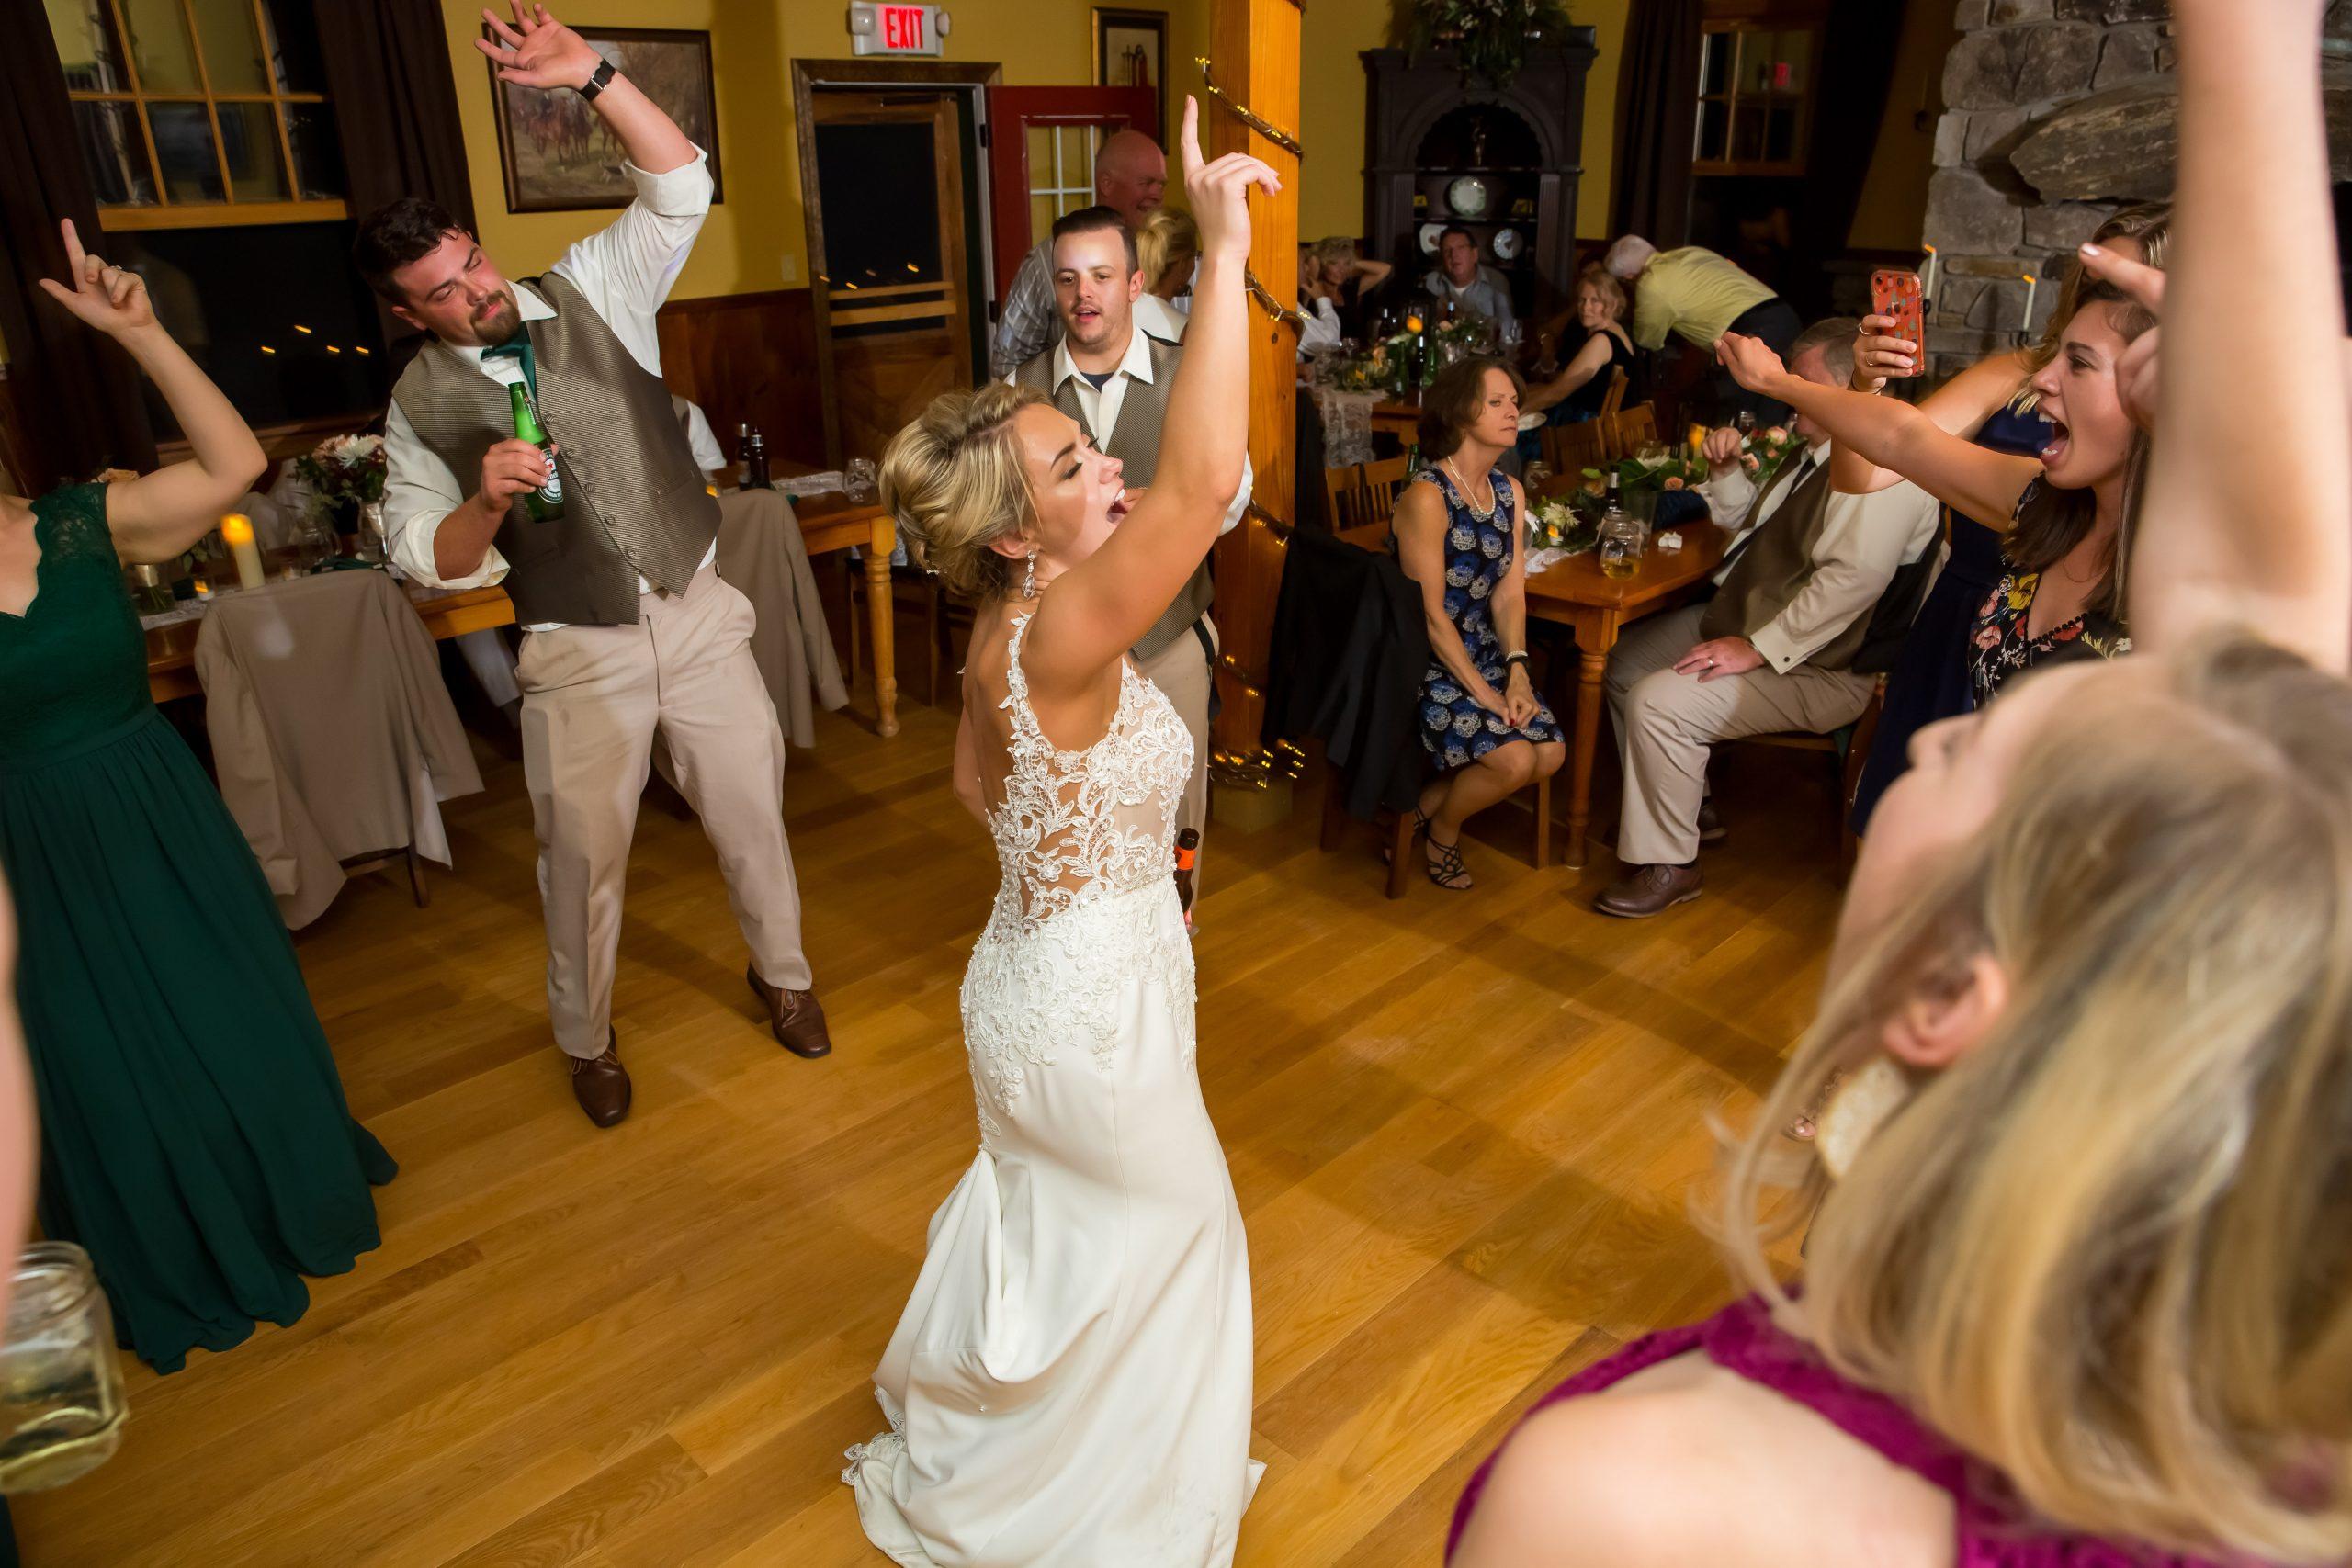 liberty_ridge_wedding57.jpg